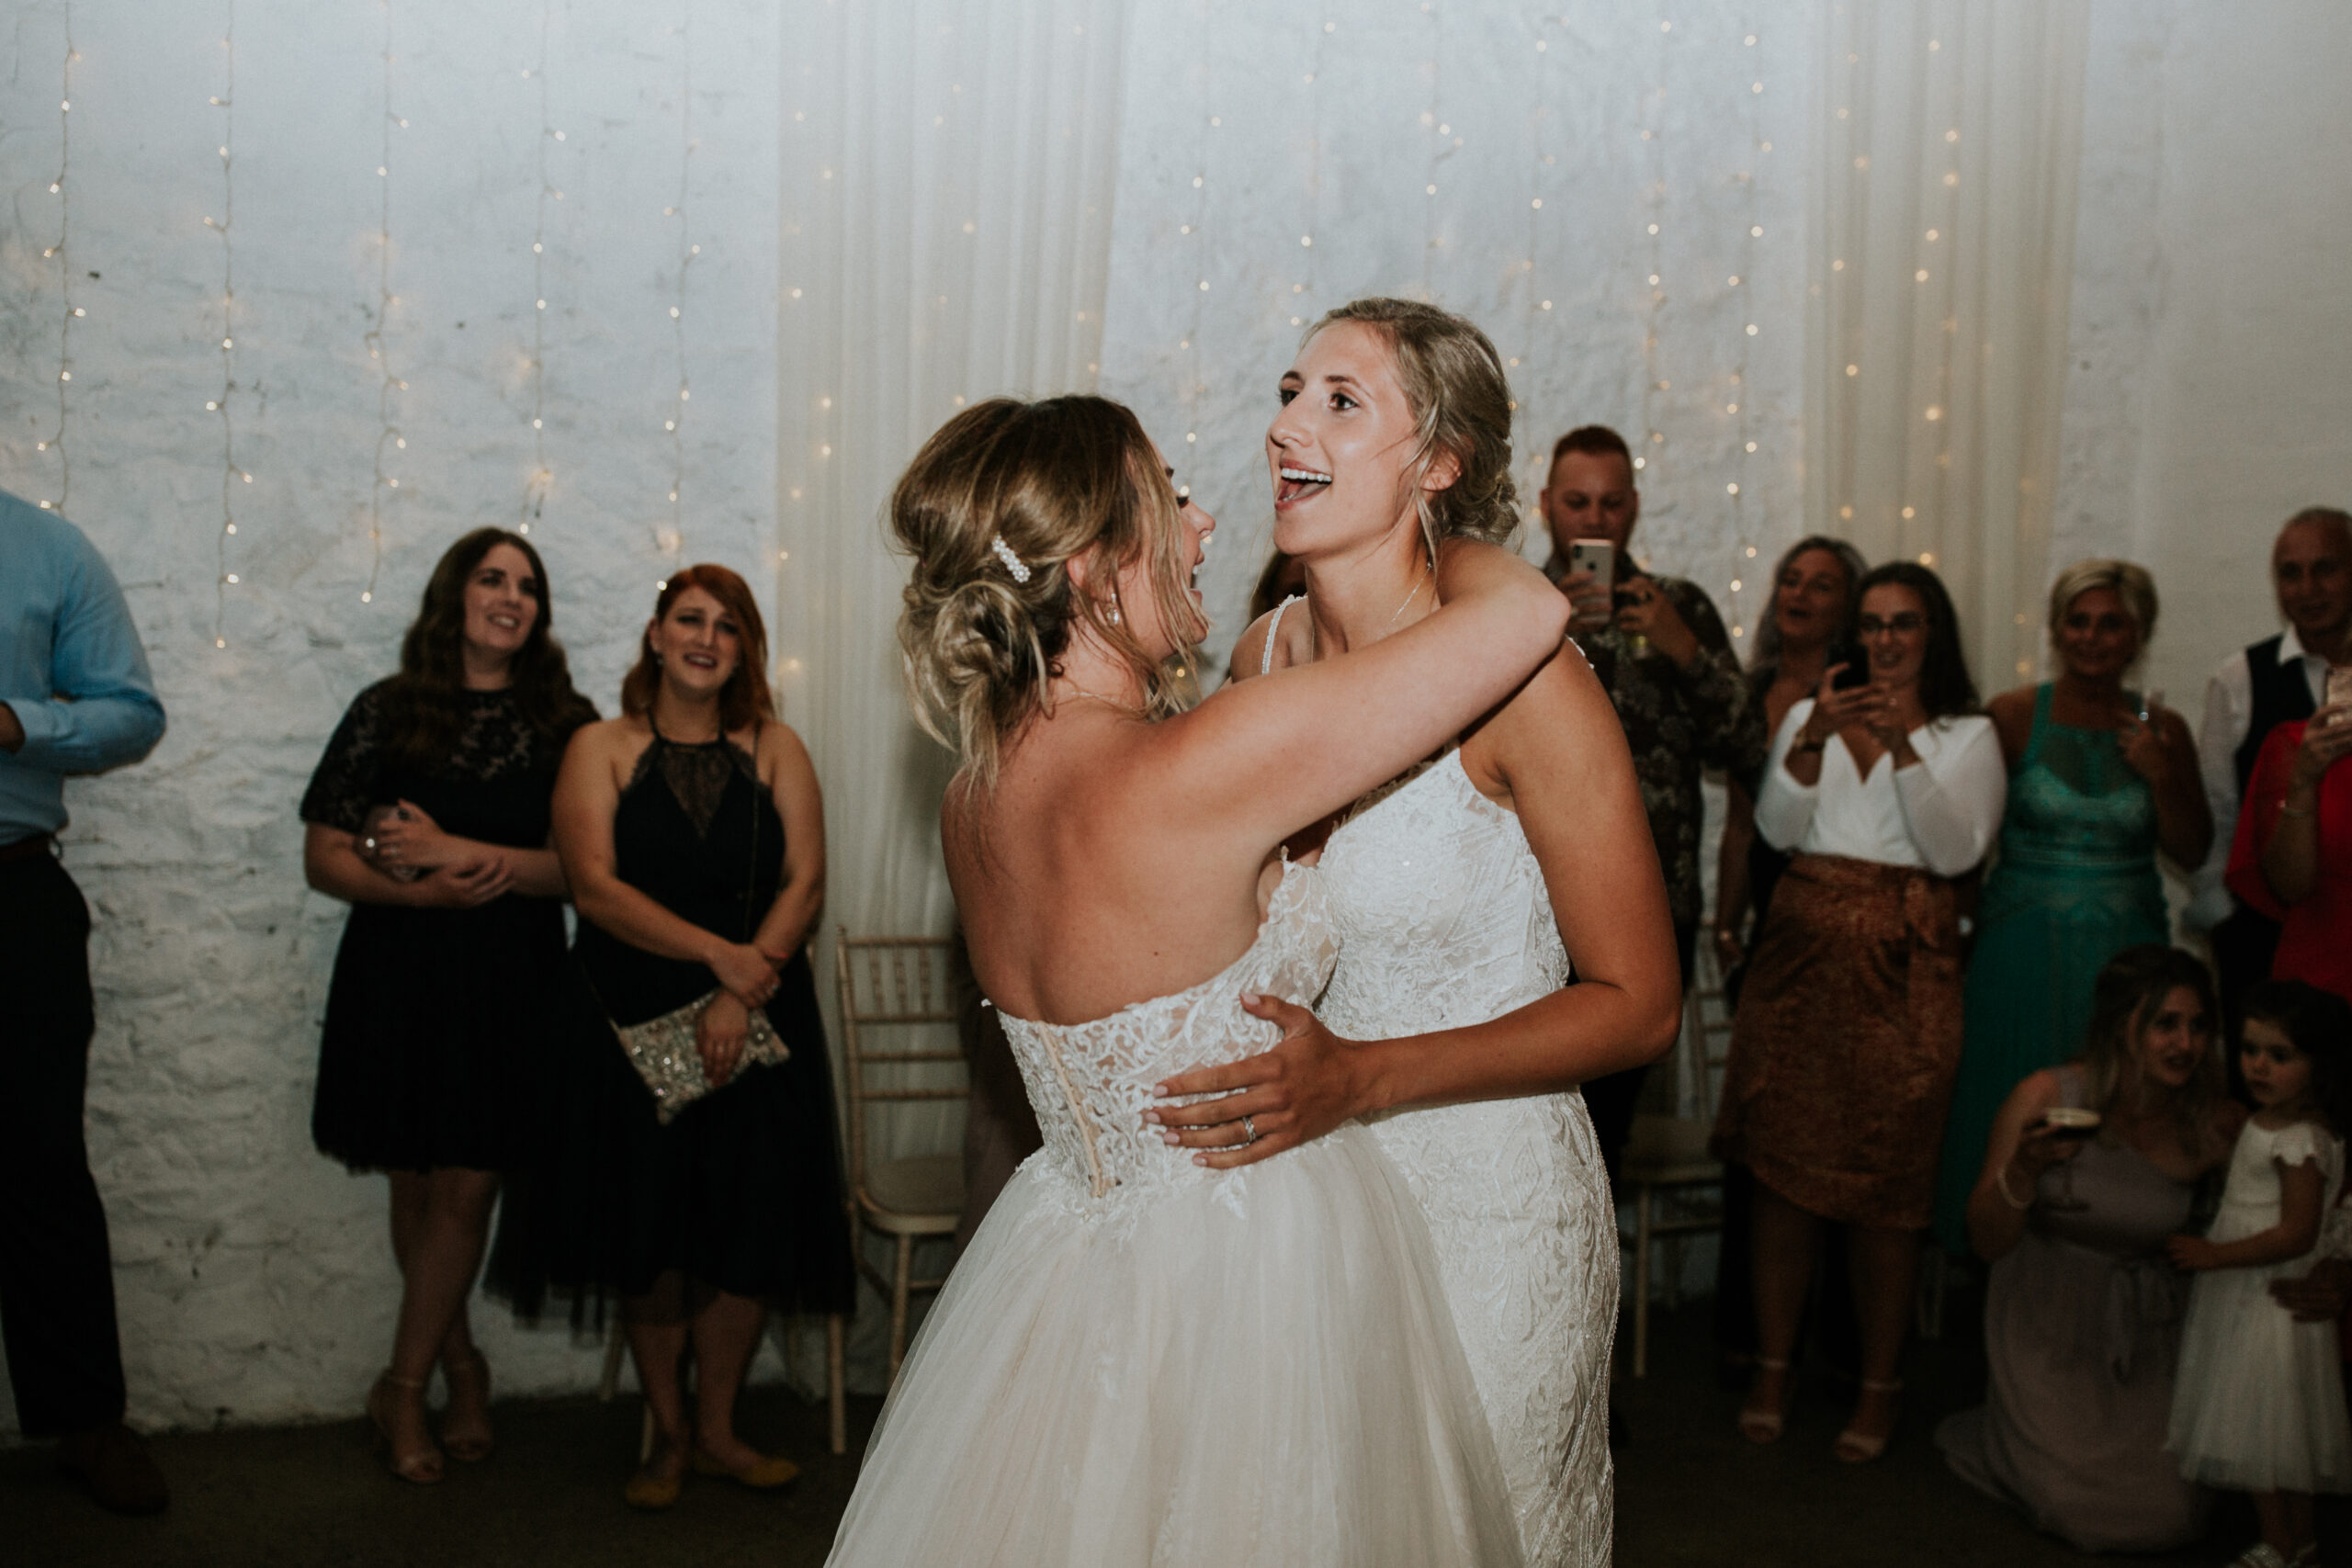 brides dancing their first dance